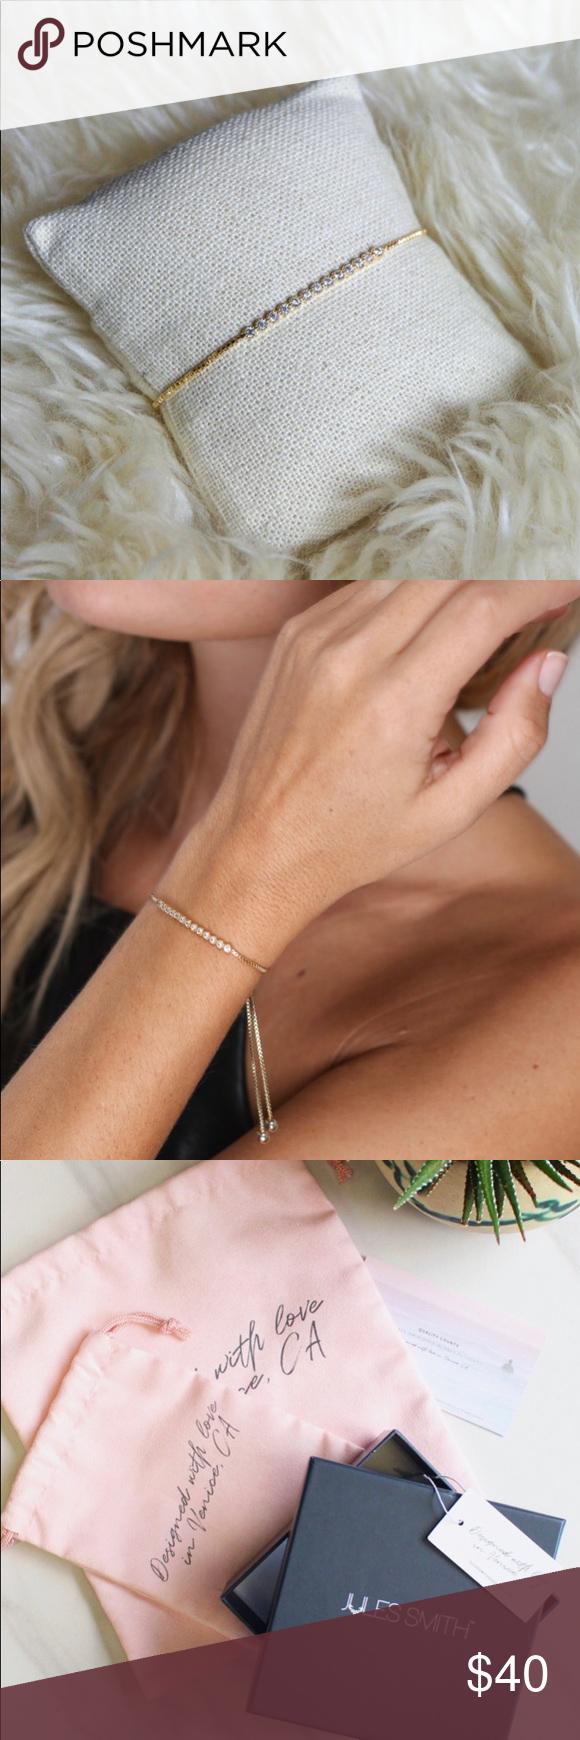 Jules Smith Designs Daisy Chain Bracelet In 2020 Chain Bracelet How To Make Beads Daisy Chain